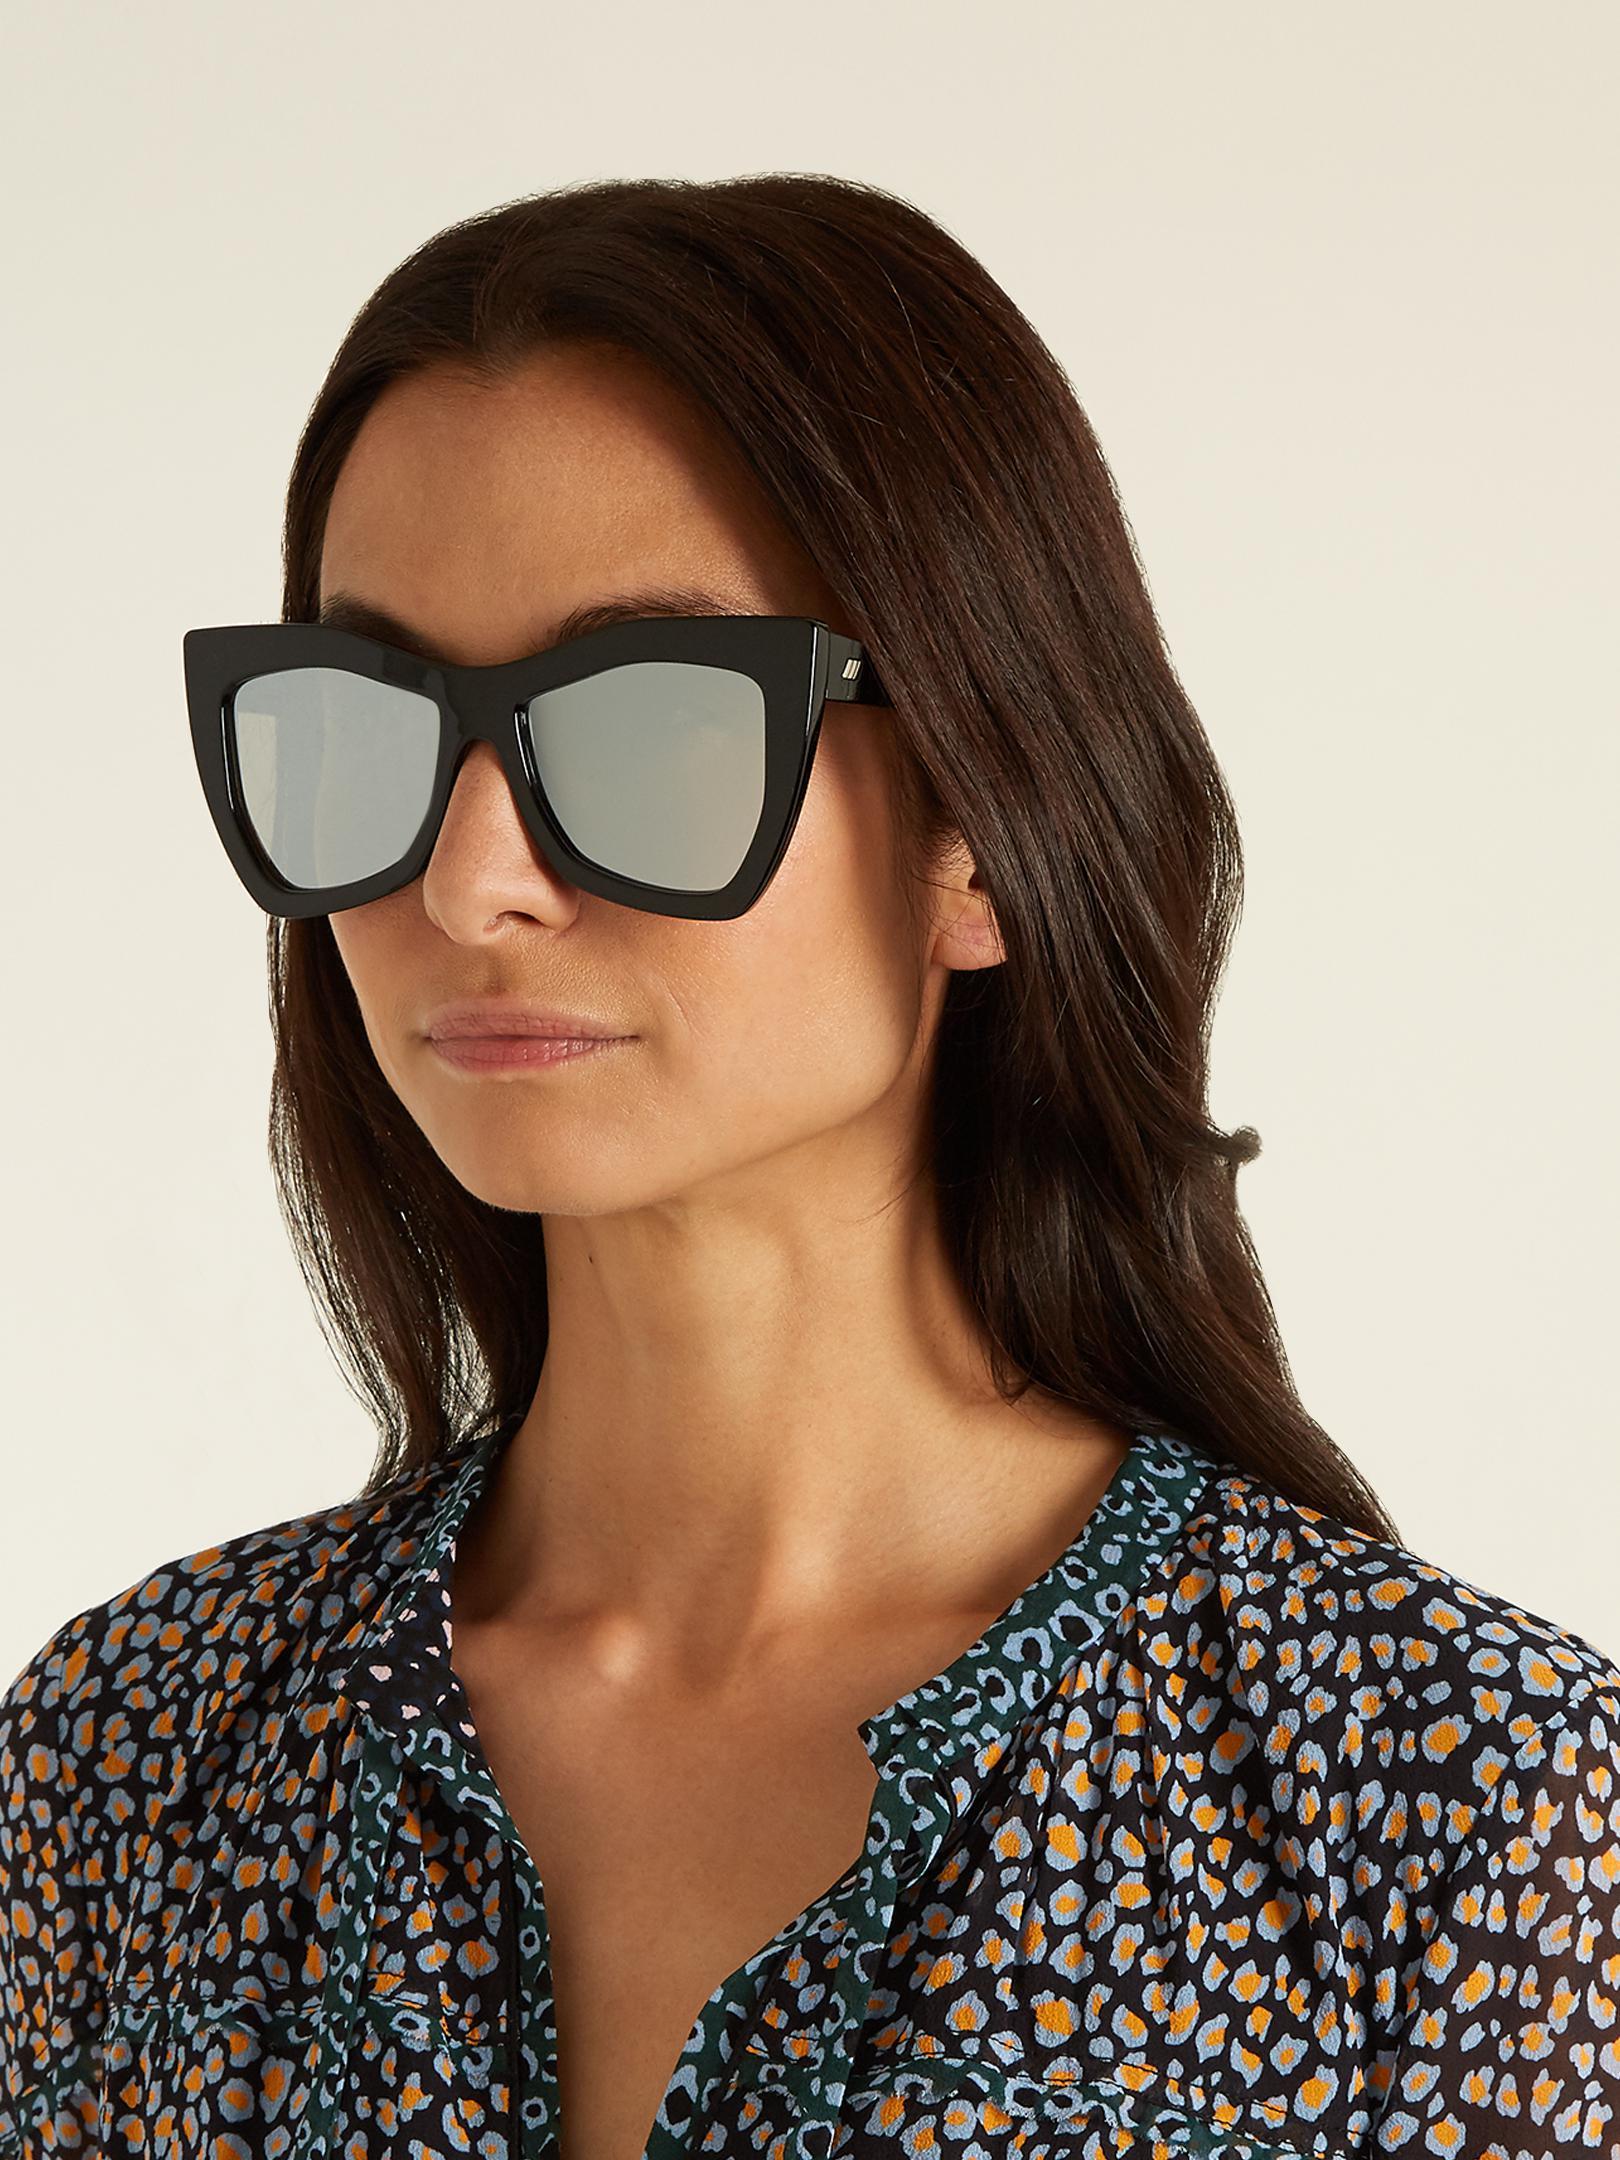 Le Specs Kick It Oversized Mirrored Sunglasses in Black